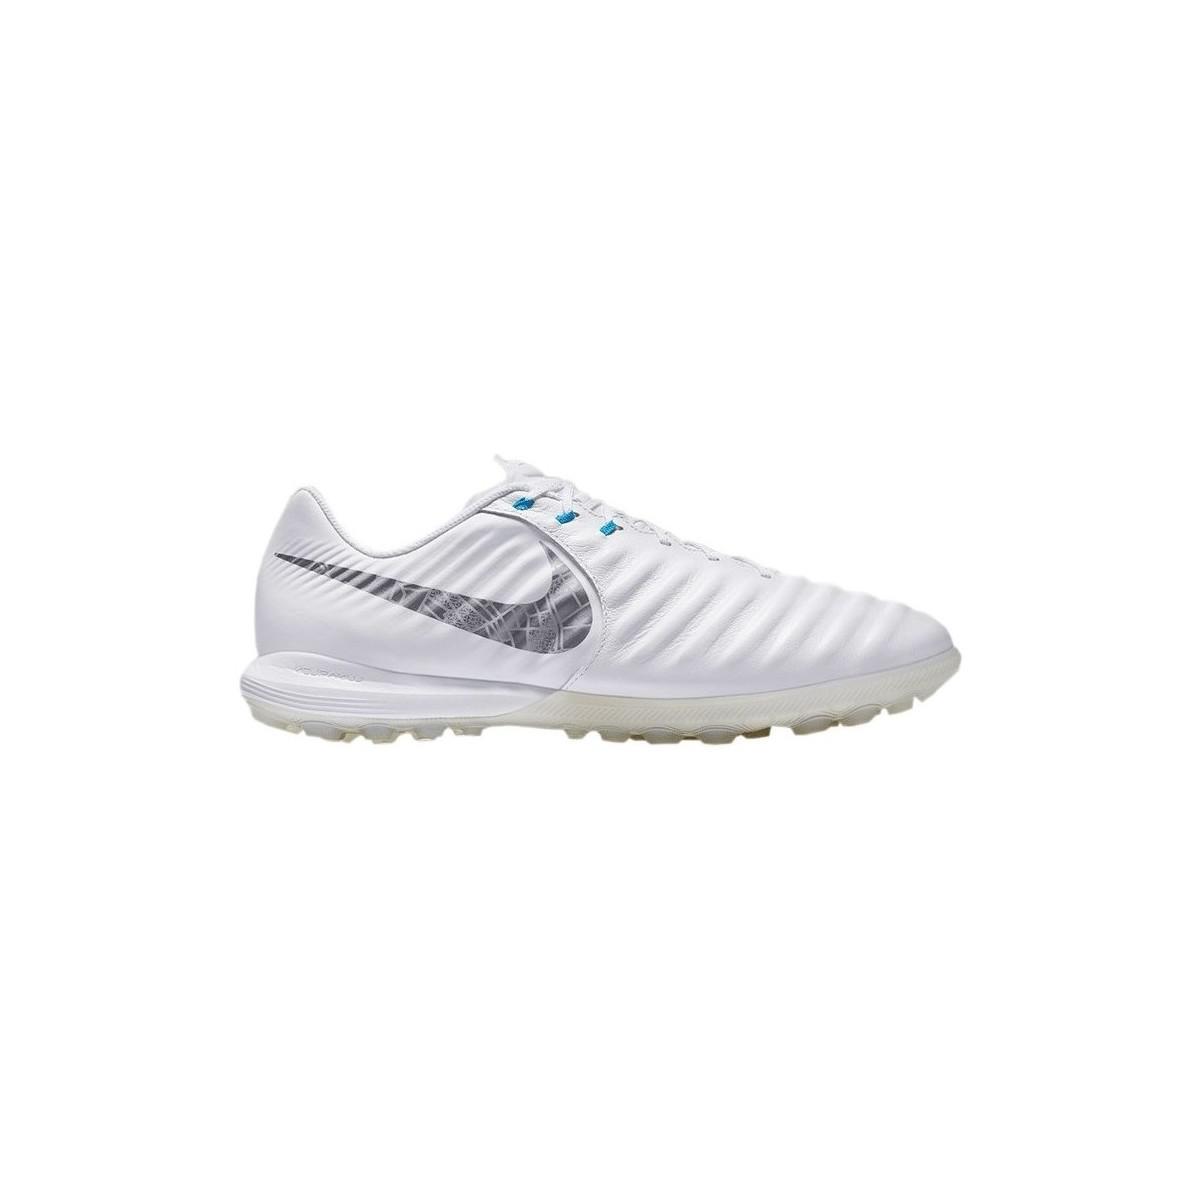 wholesale dealer a4c5f fce14 Nike Lunar Legend 7 Pro Tf Men s Football Boots In White in White ...